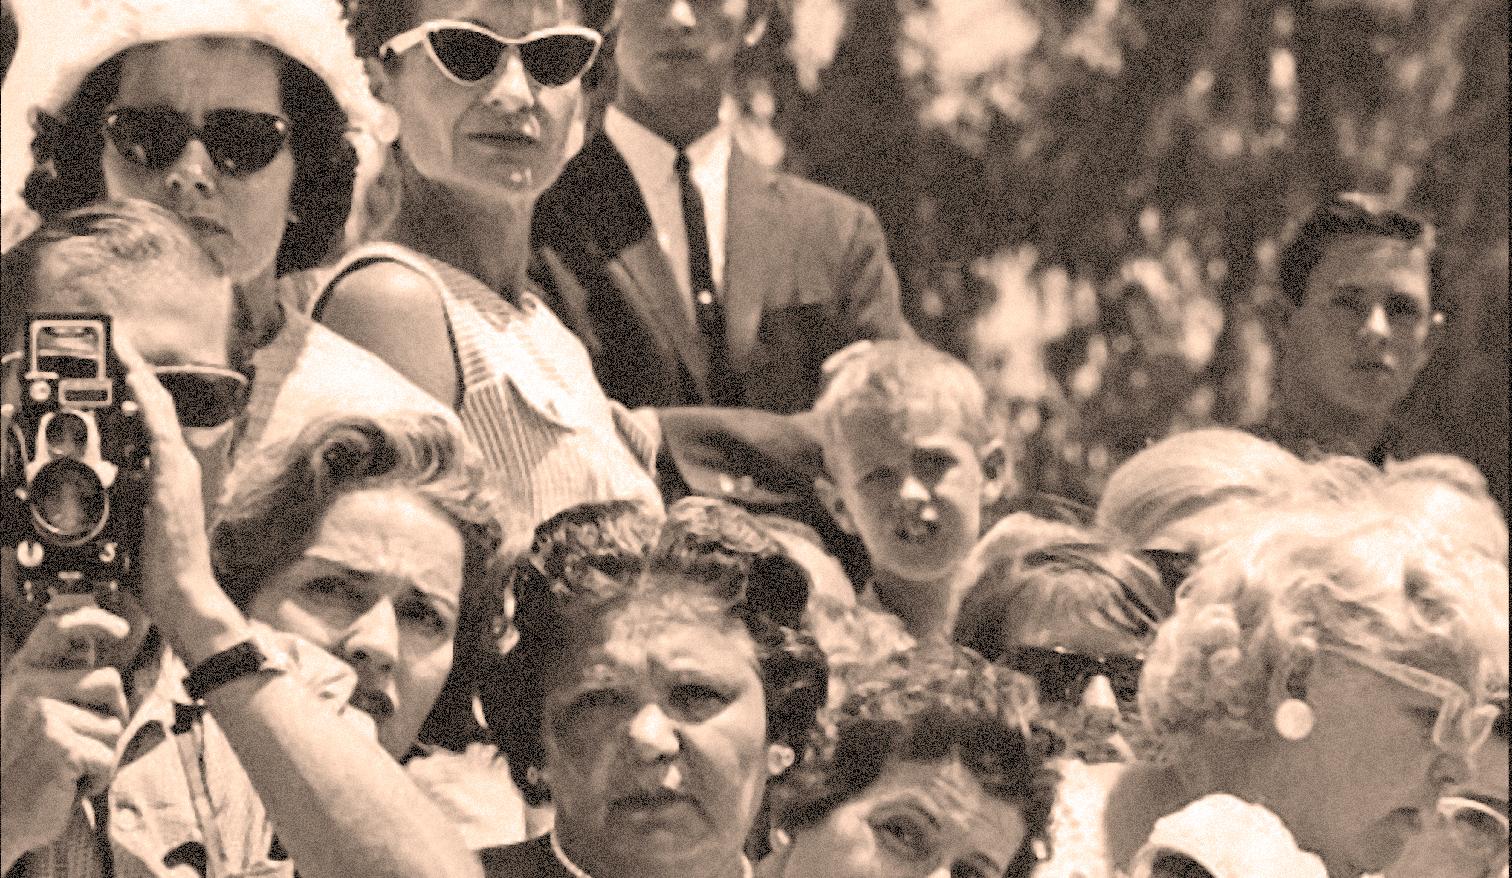 Marilyn-Monroe-funeral-8-resize